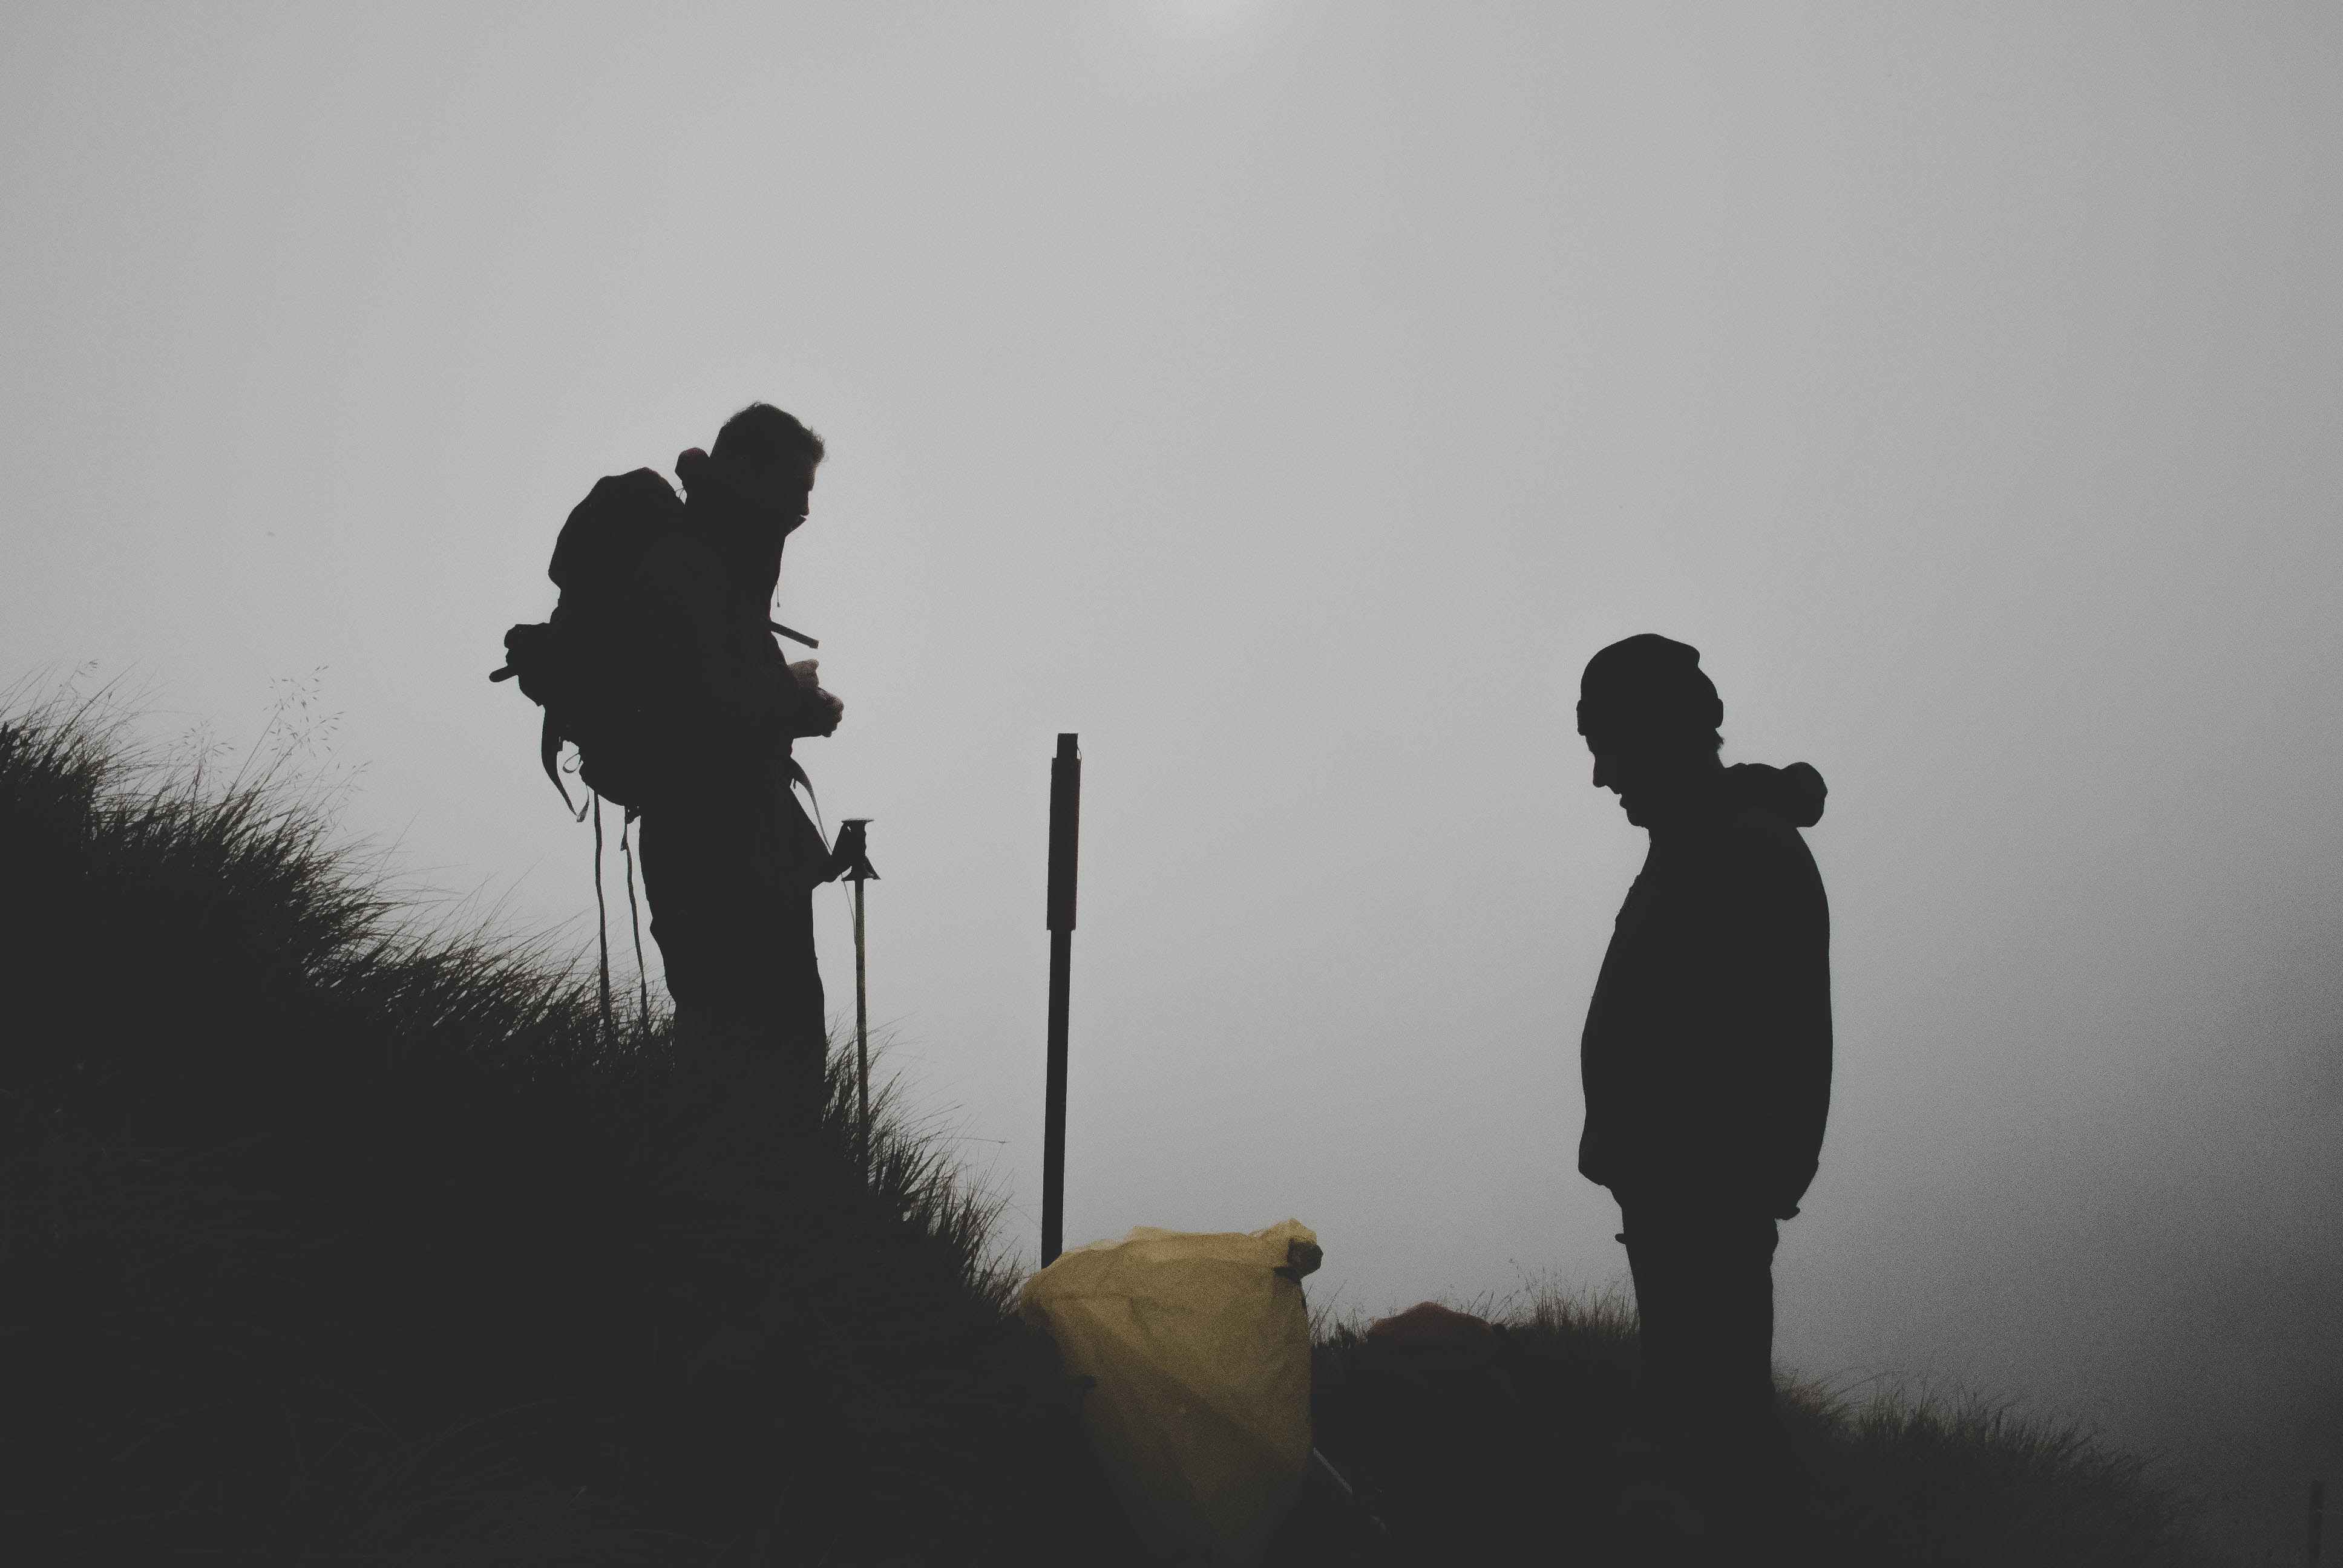 silhouette photo of two men climbing mountain